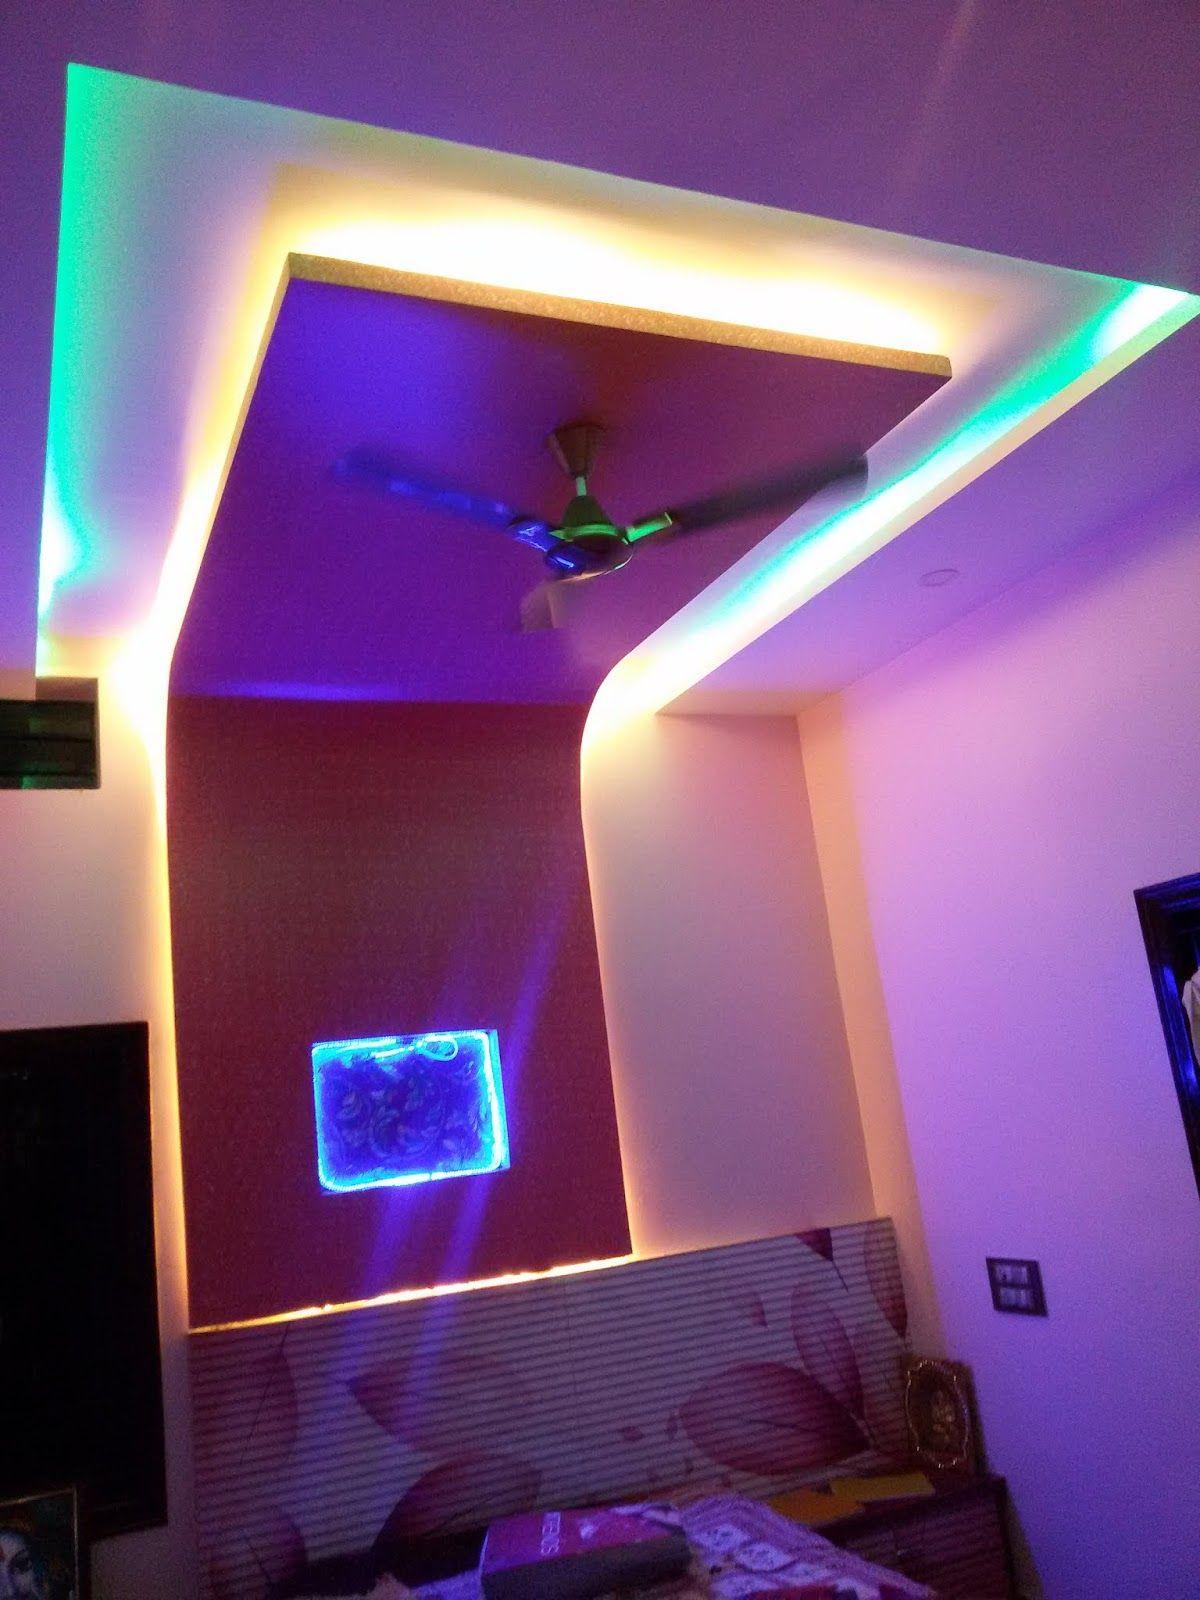 Attractive Pop Hall Ceiling Design 2019 Home Designs Inspiration In 2020 Pop False Ceiling Design Bedroom False Ceiling Design Pop Ceiling Design